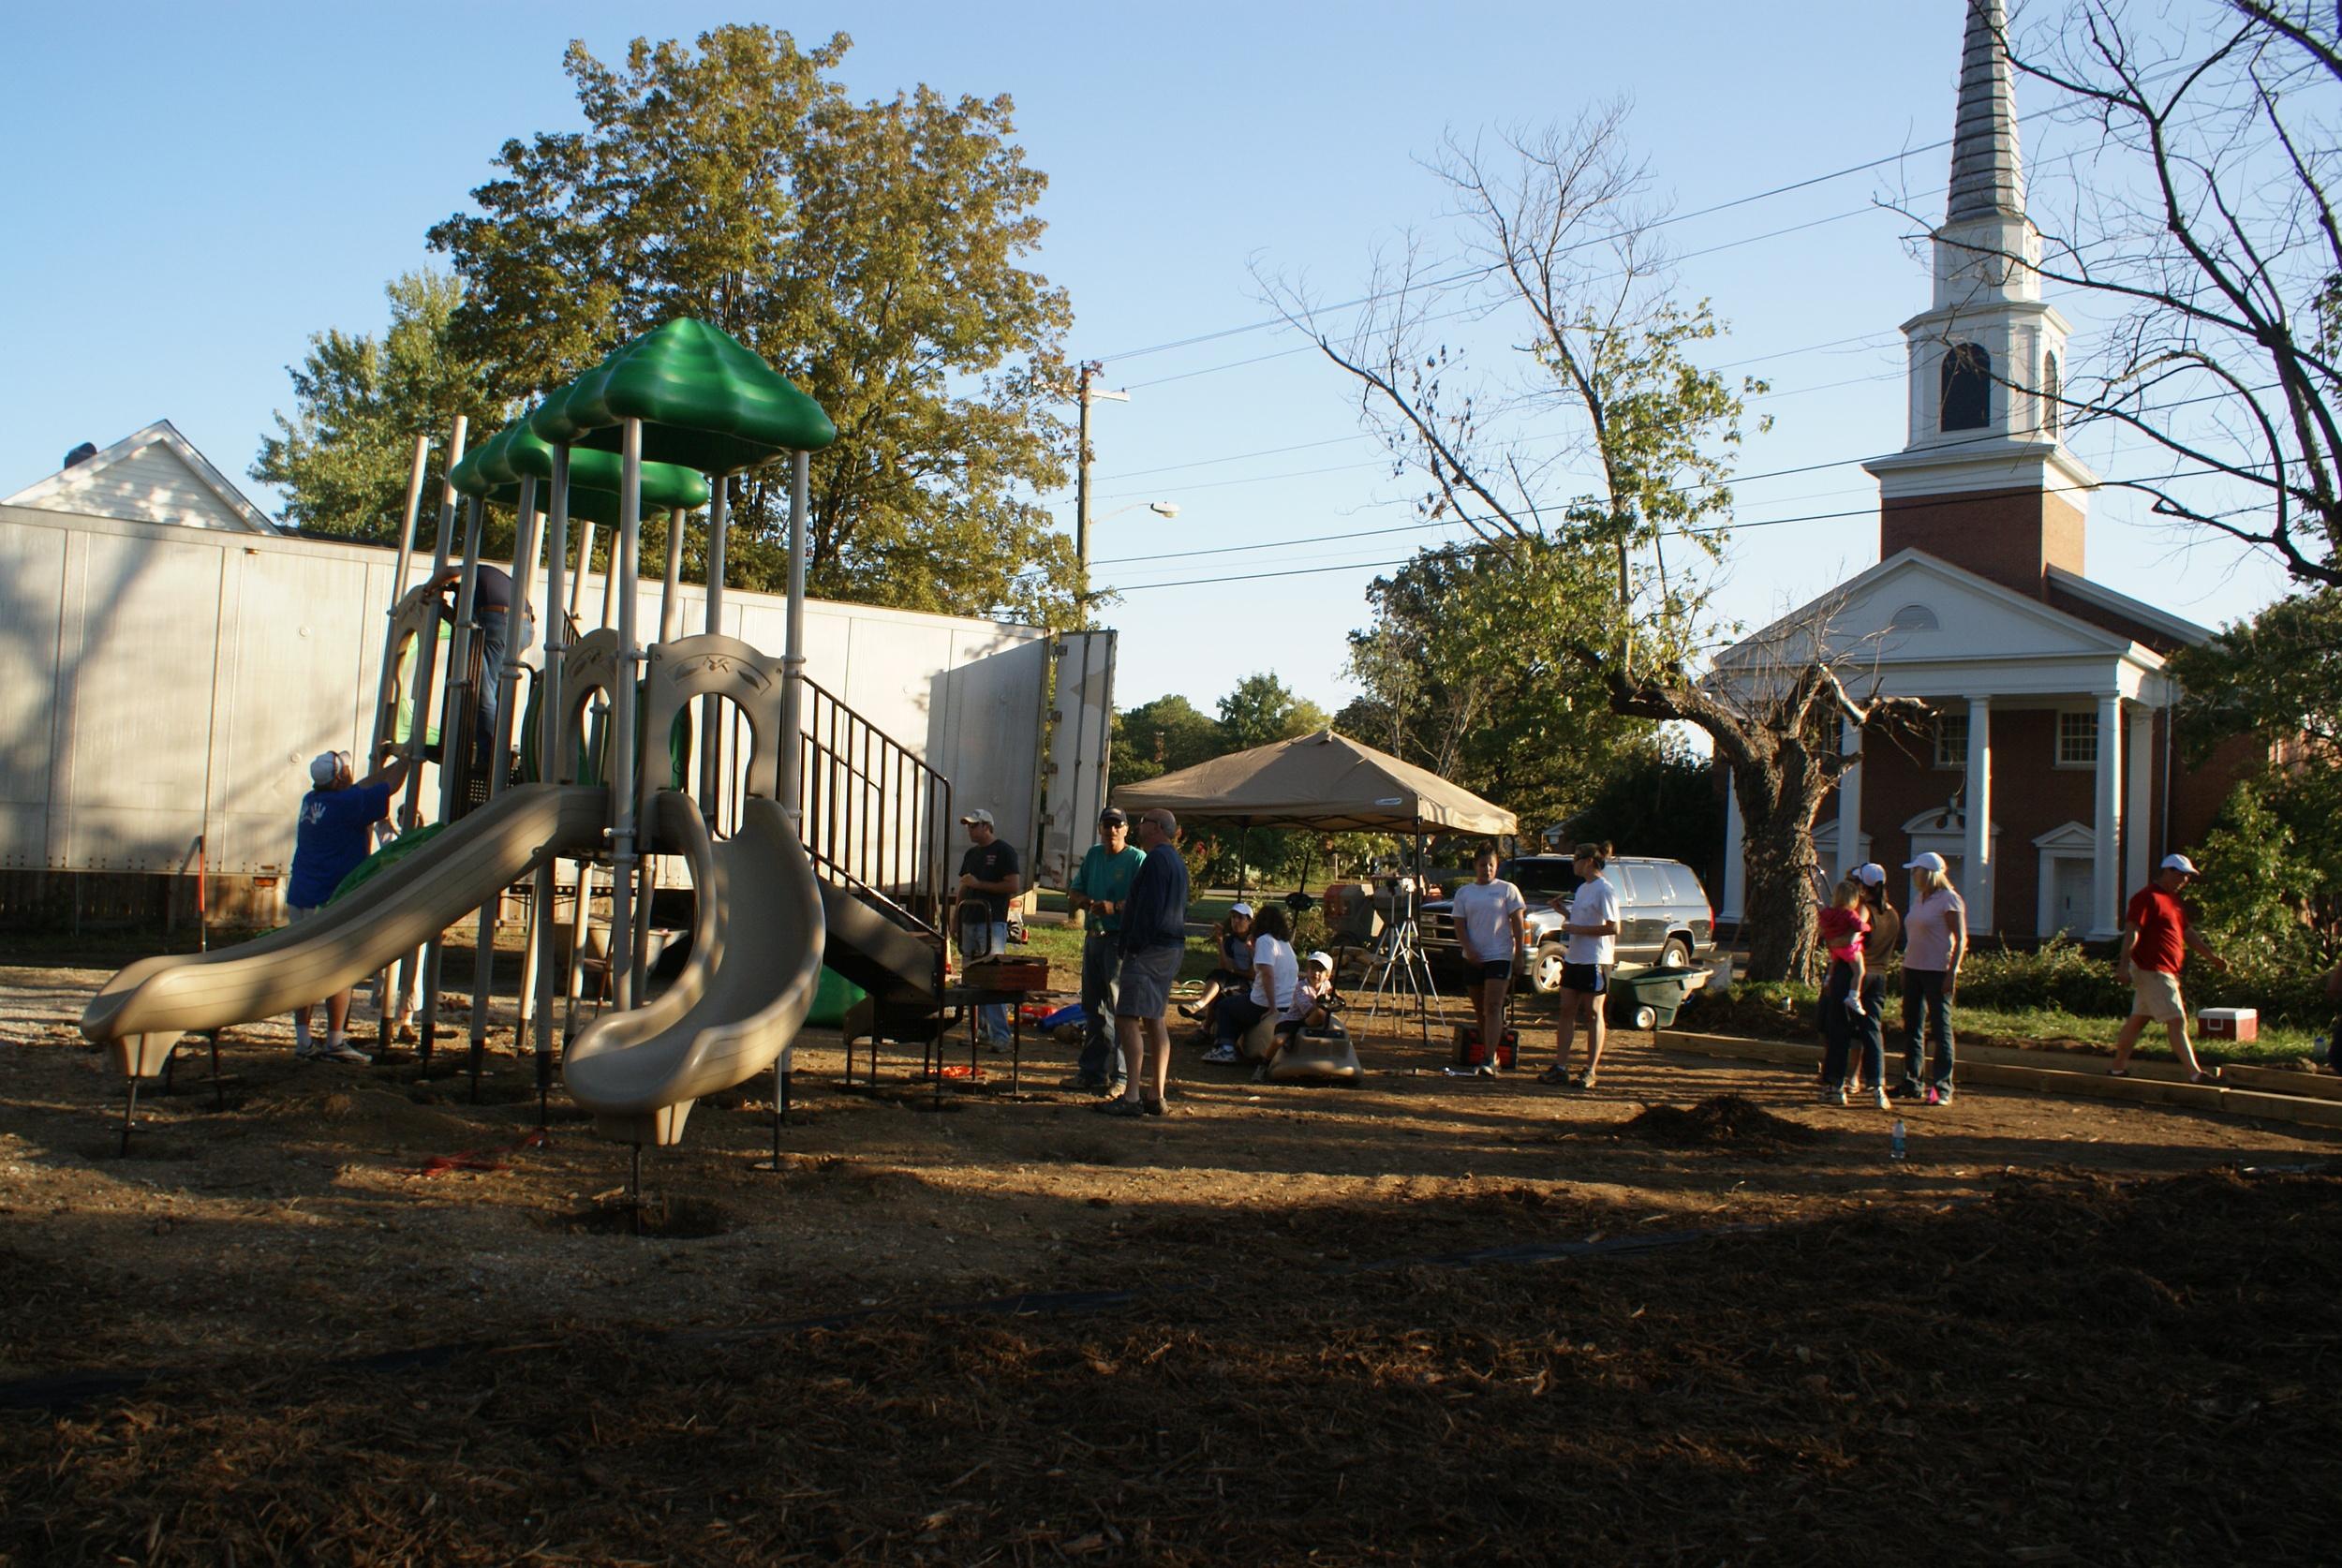 East 3rd Street Playground